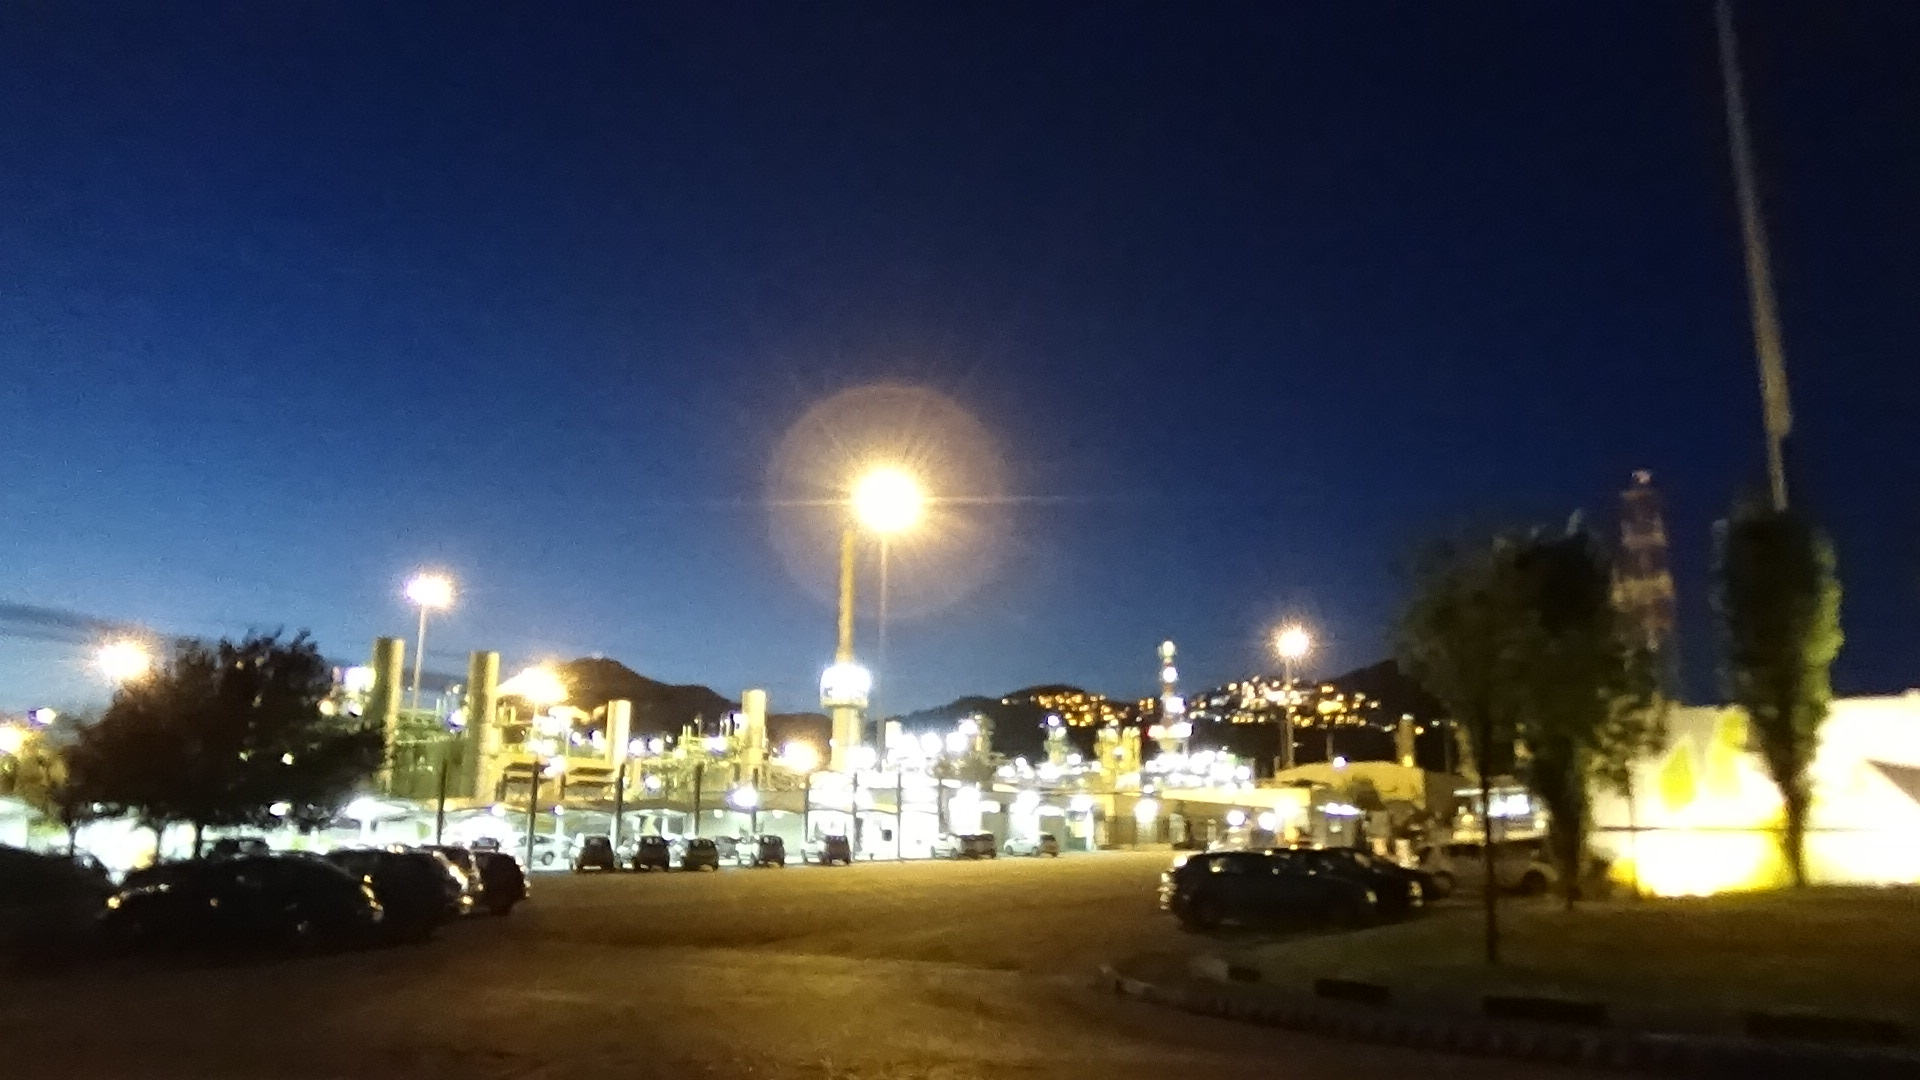 il Cova in notturna - ingresso principale - 2016